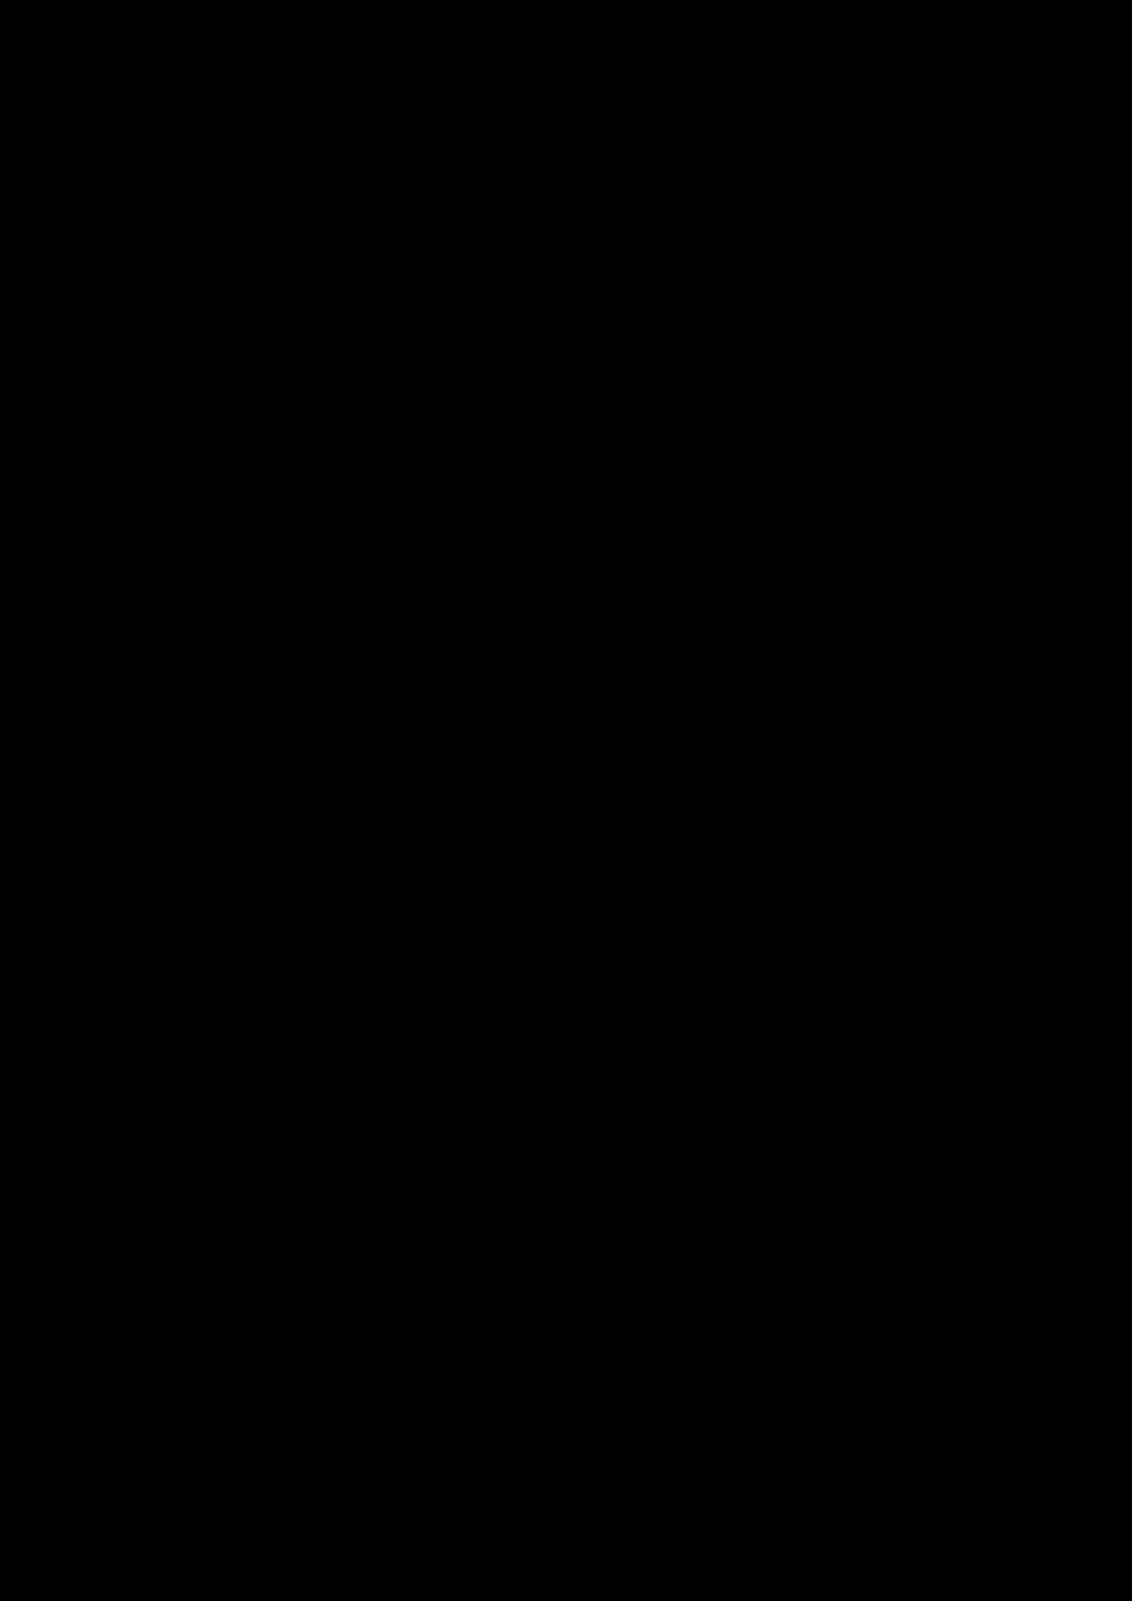 Mrs. Vandebilt slide, Image 1